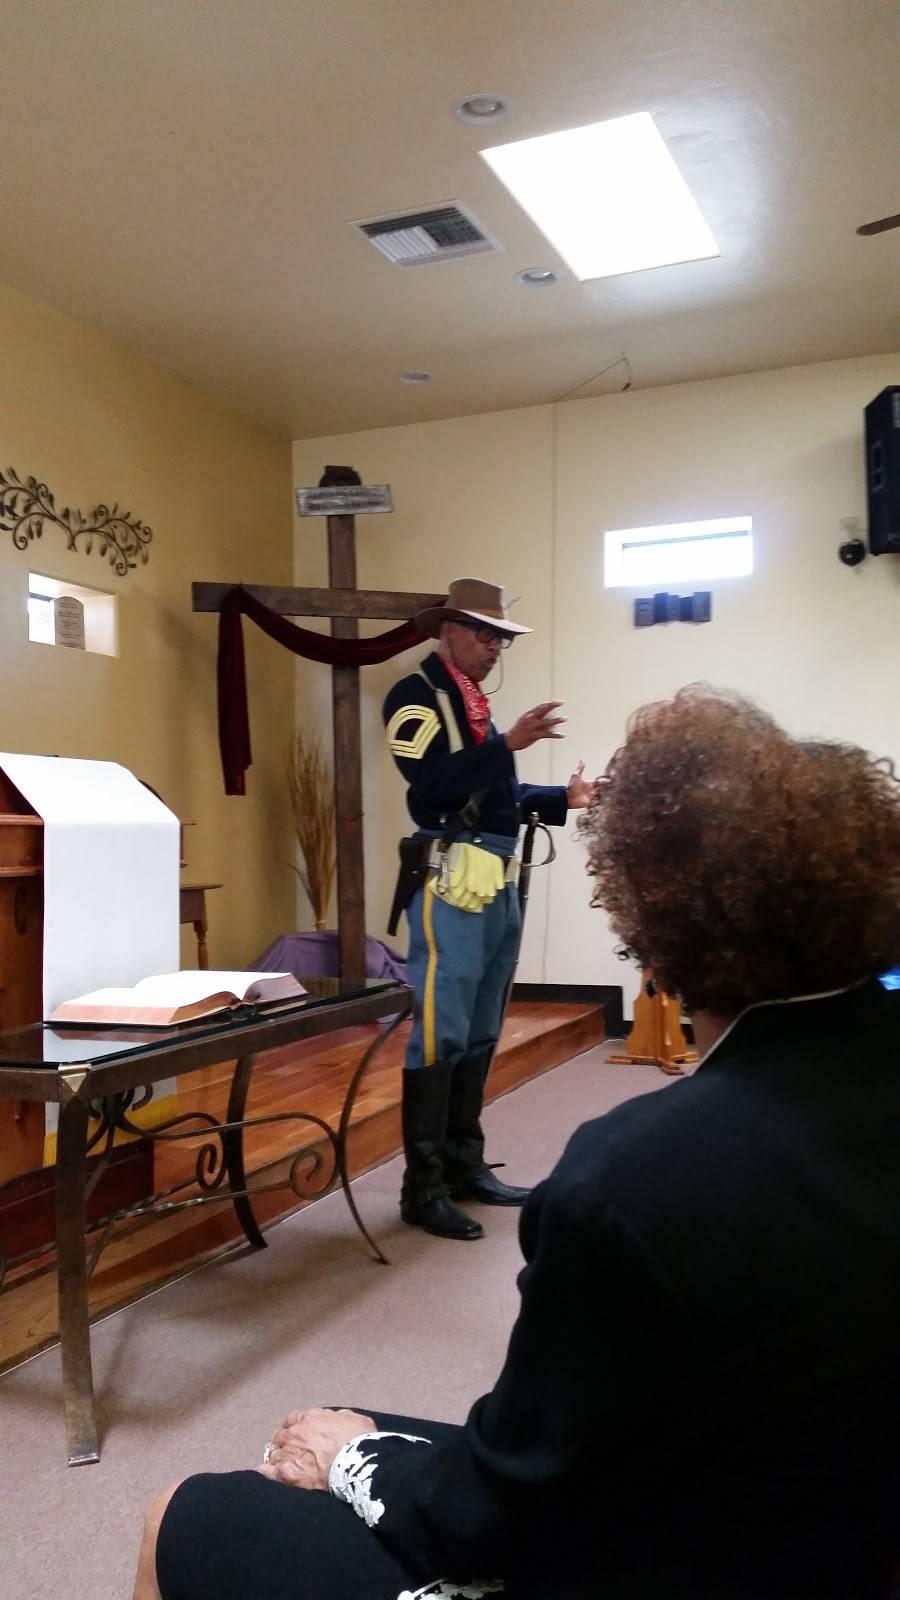 Christ Kingdom Fellowship Church - church  | Photo 3 of 3 | Address: 1736 W San Marcos Blvd, Tucson, AZ 85713, USA | Phone: (520) 300-4417